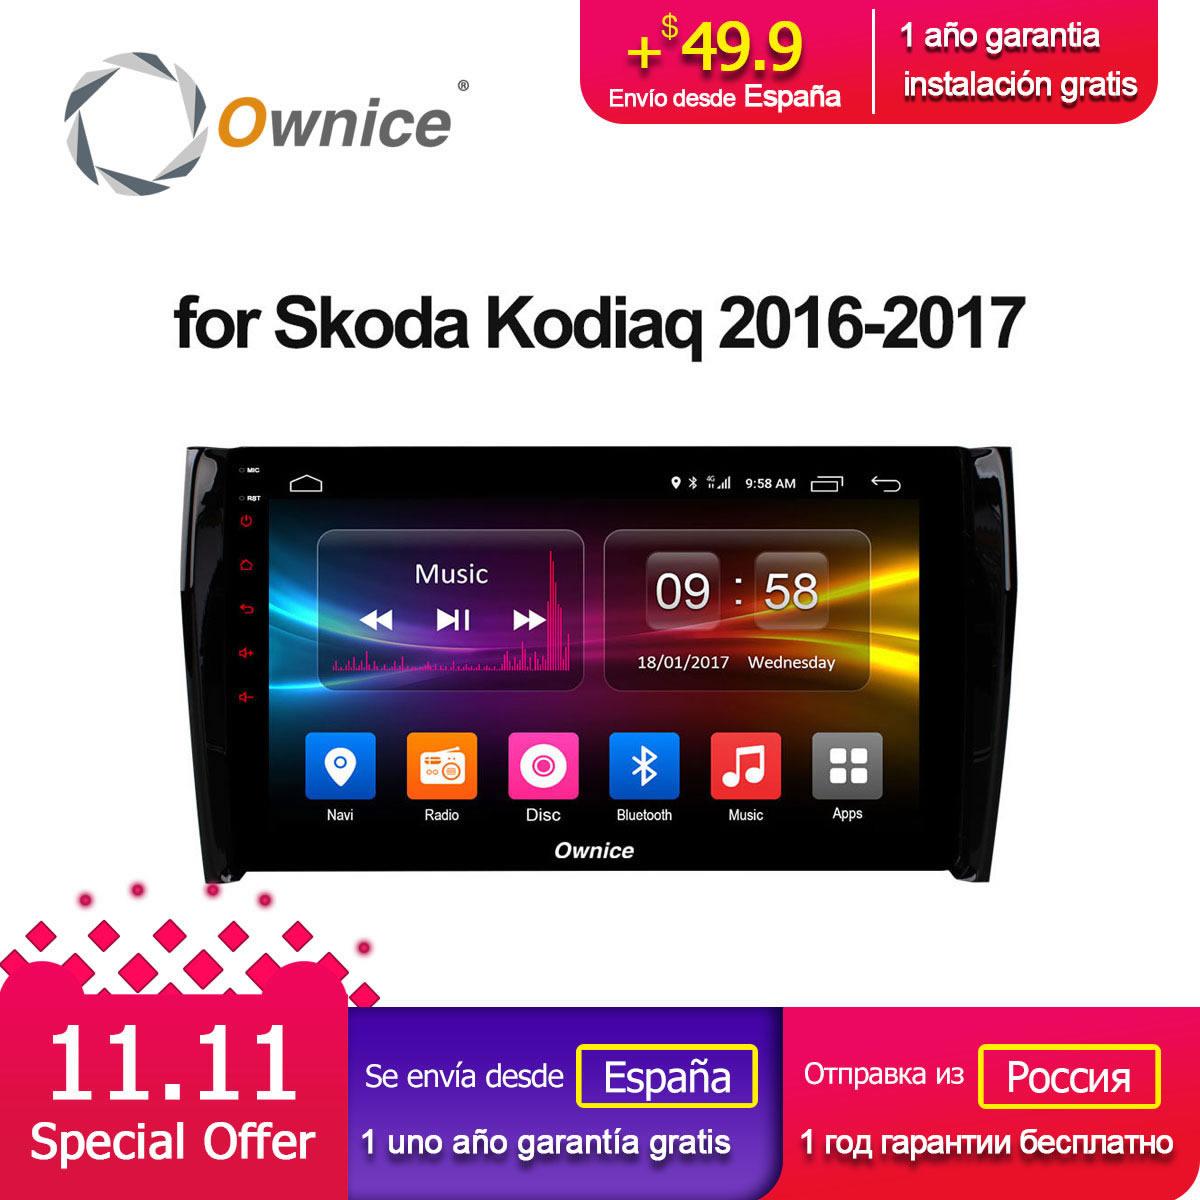 Ownice c500+ G10 10.1 Android 8.1 Octa Core 2GB RAM car dvd gps For Skoda Kodiaq 2016 2017 Support 4G SIM RDS DAB+ Carplay ownice c500 4g sim lte octa 8 core android 6 0 for kia ceed 2013 2015 car dvd player gps navi radio wifi 4g bt 2gb ram 32g rom